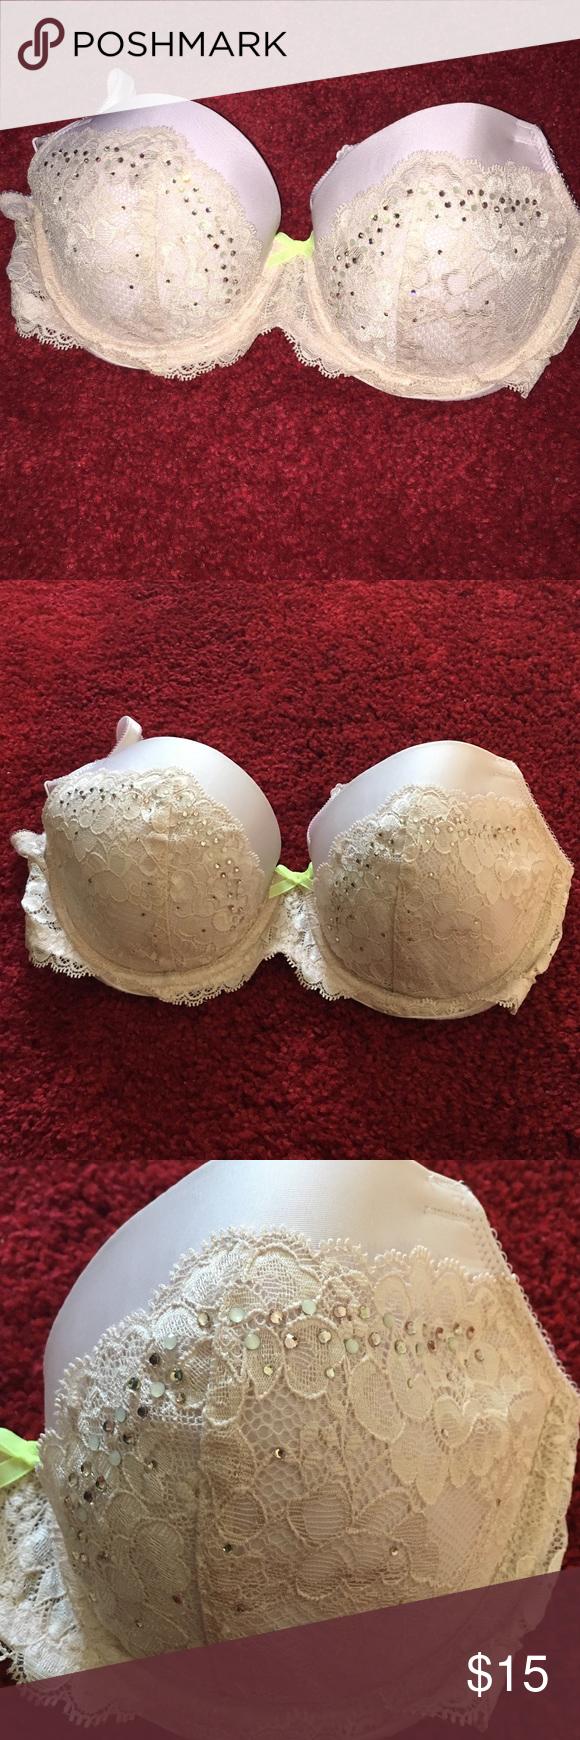 Victoria secret bra Lace dream Angels 32DD Victoria's Secret Intimates & Sleepwear Bras